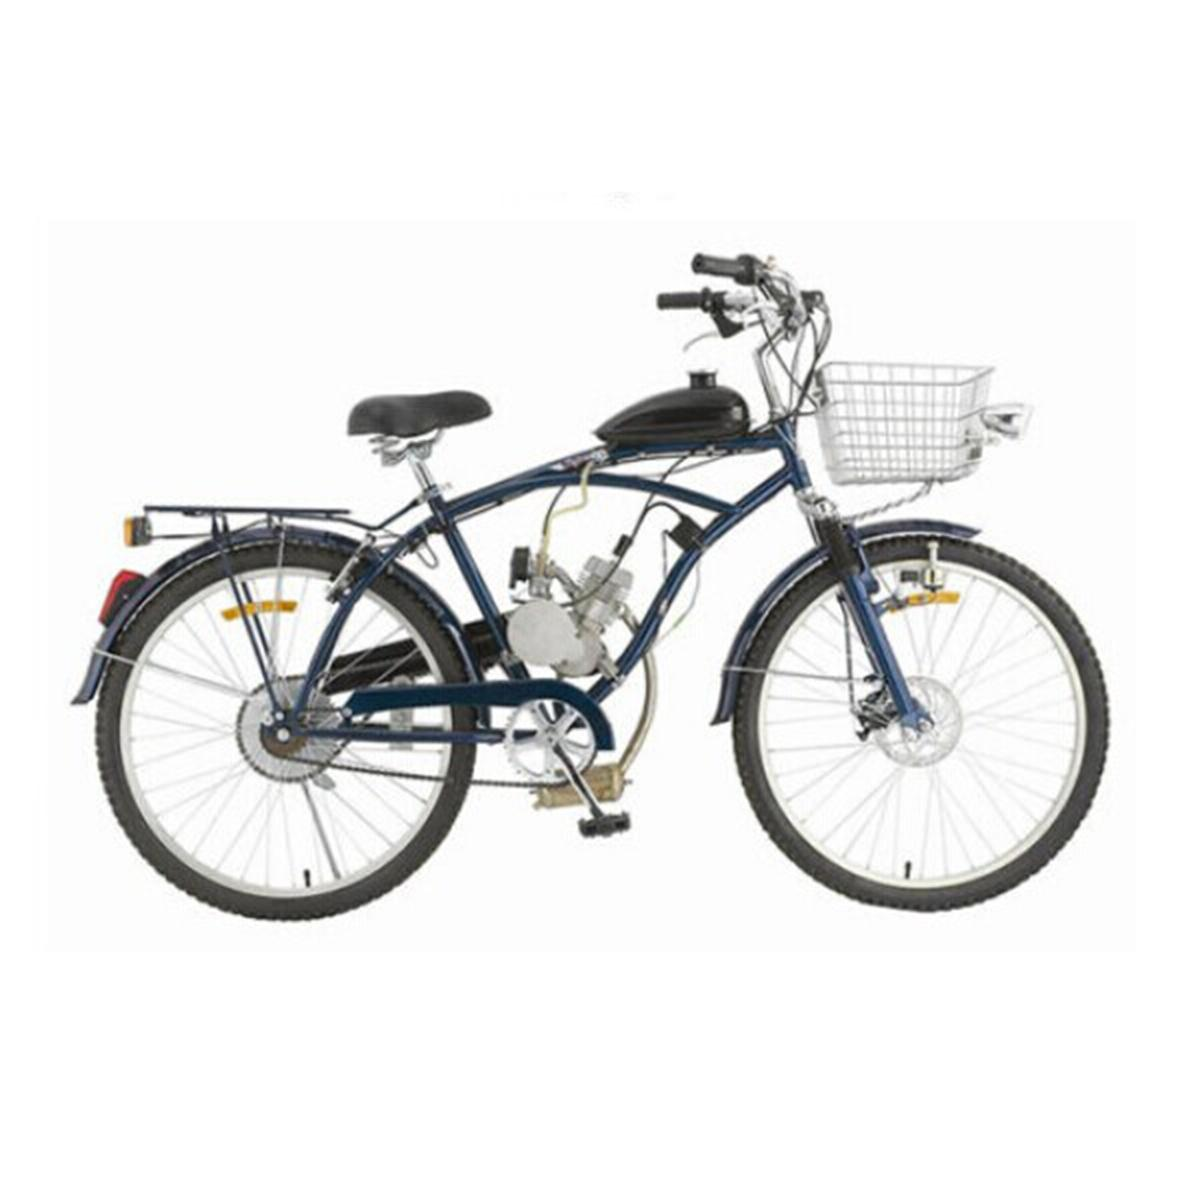 50cc 2 Stroke Cycle Motorized Bike Silver Body Engine